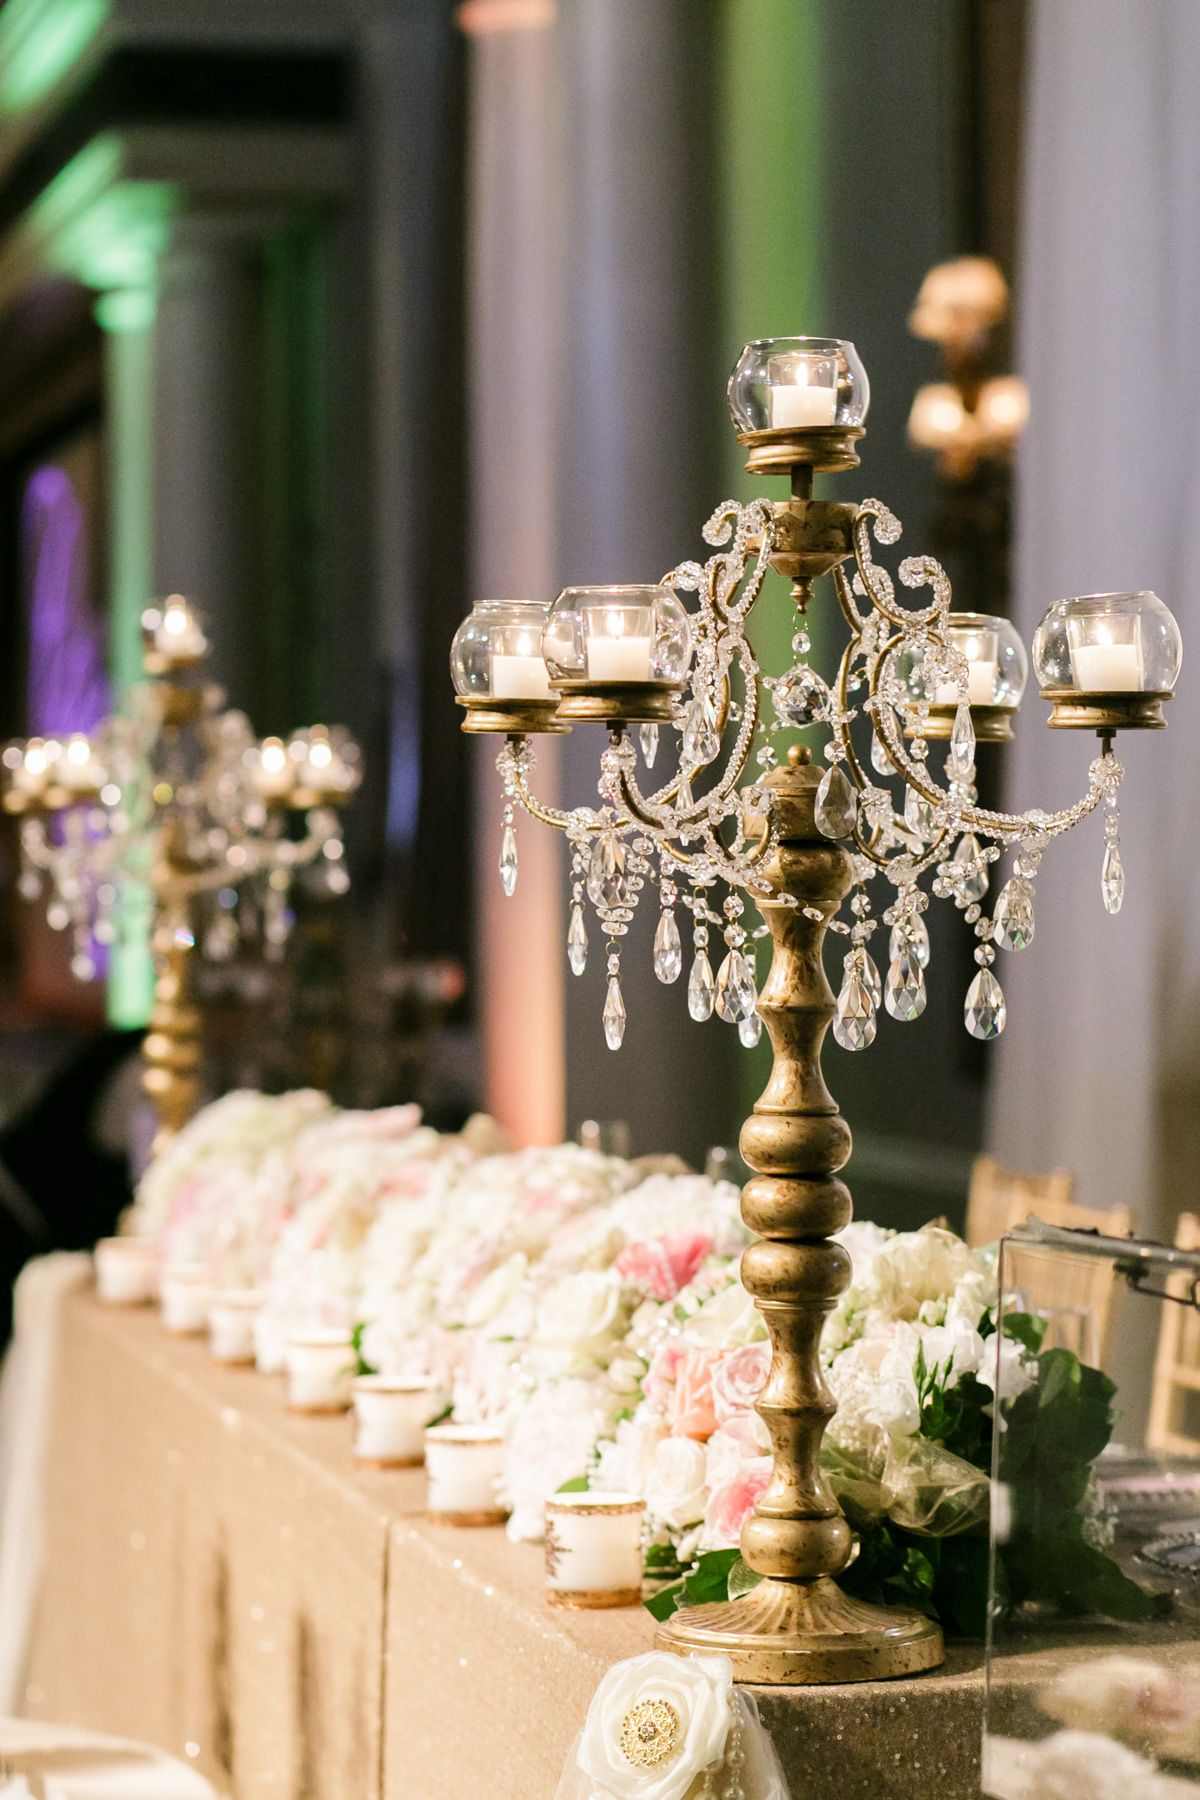 joeewong-chdi-toronto-liberty-grand-wedding-229